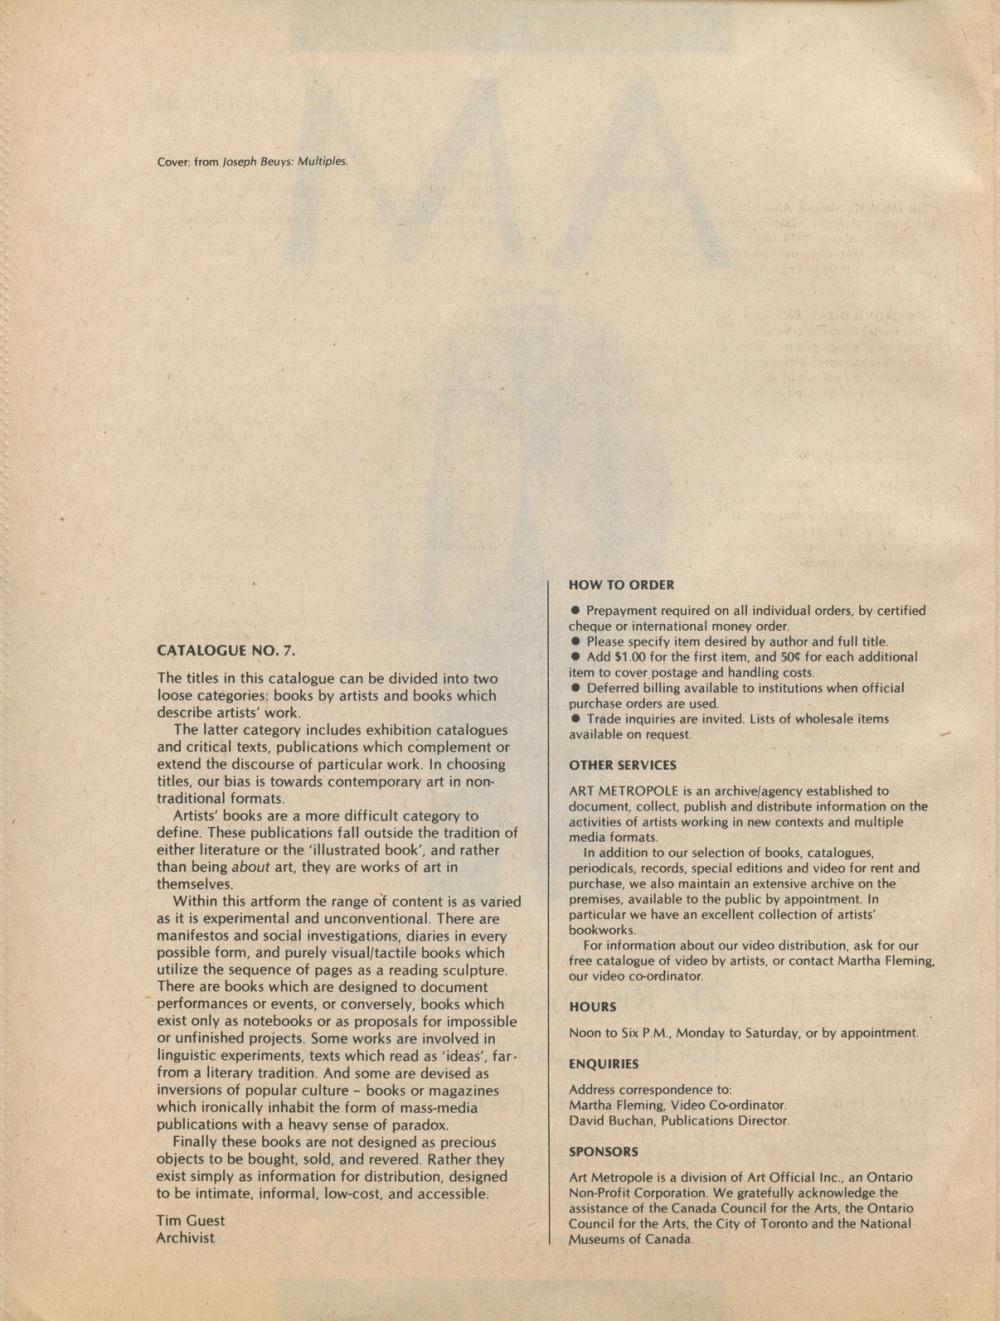 Art Metropole. Books, Special Editions, Records, Periodicals, Ca